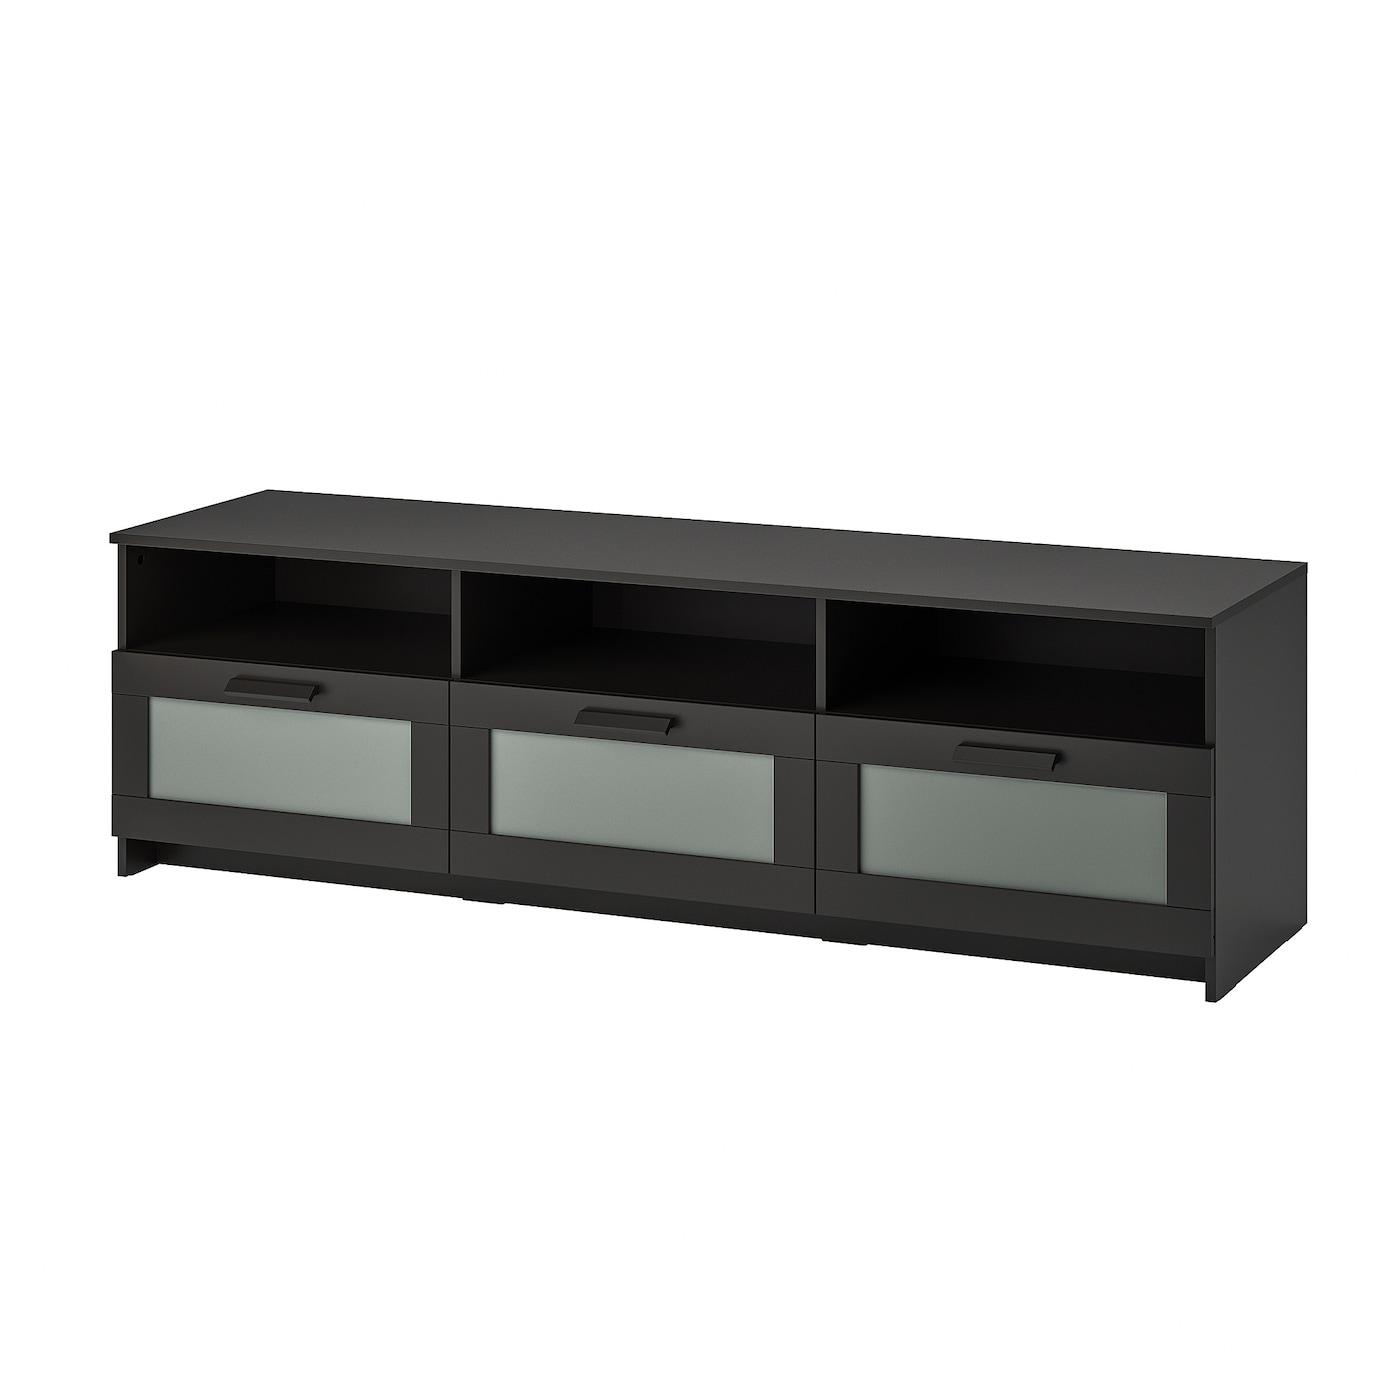 Ikea Kitchen Drawer Dividers